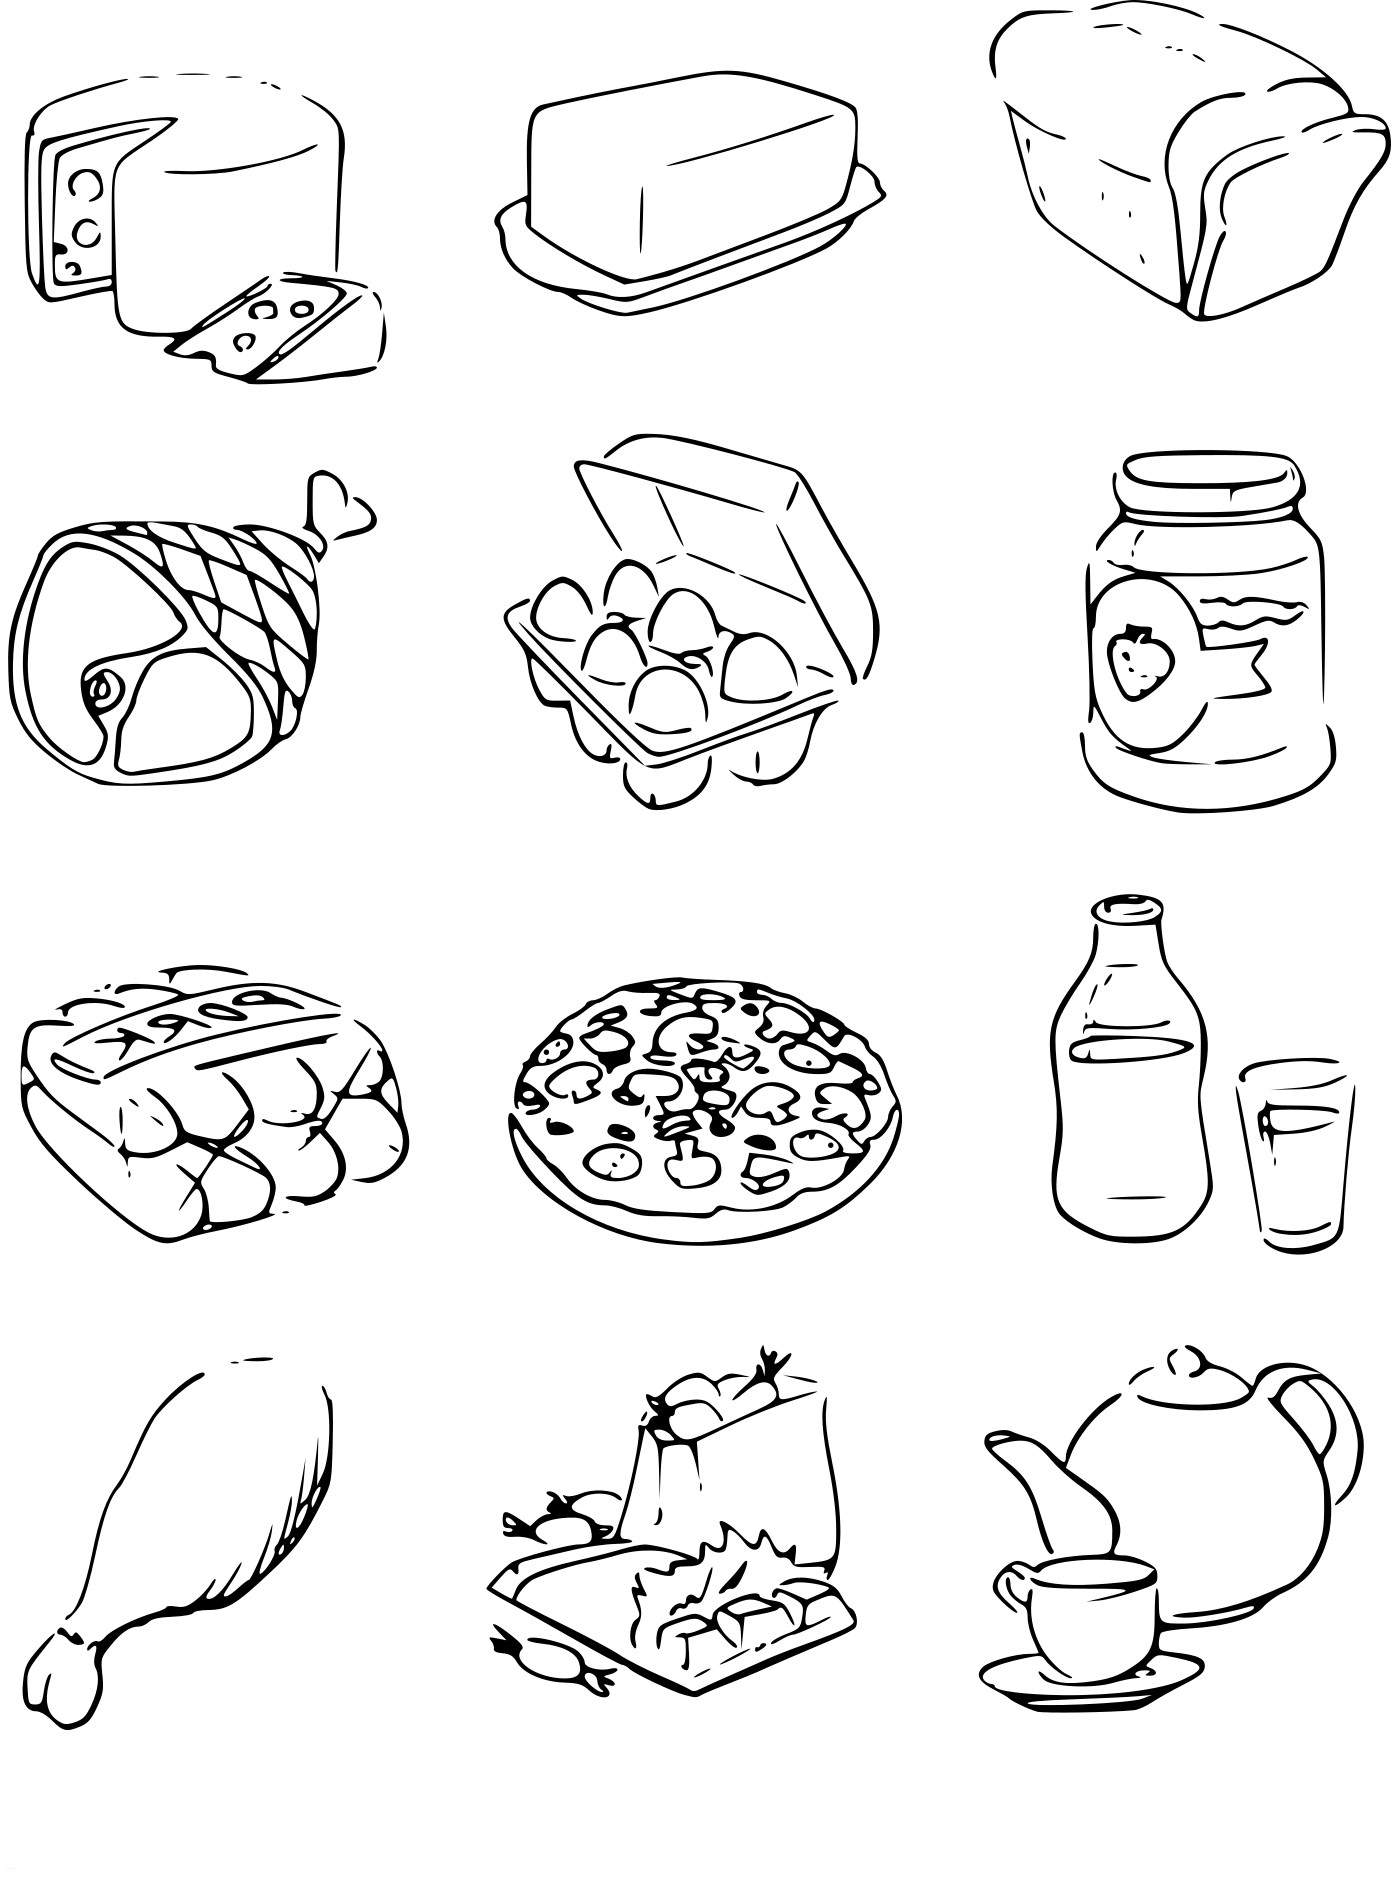 Coloriage Nourriture à Imprimer